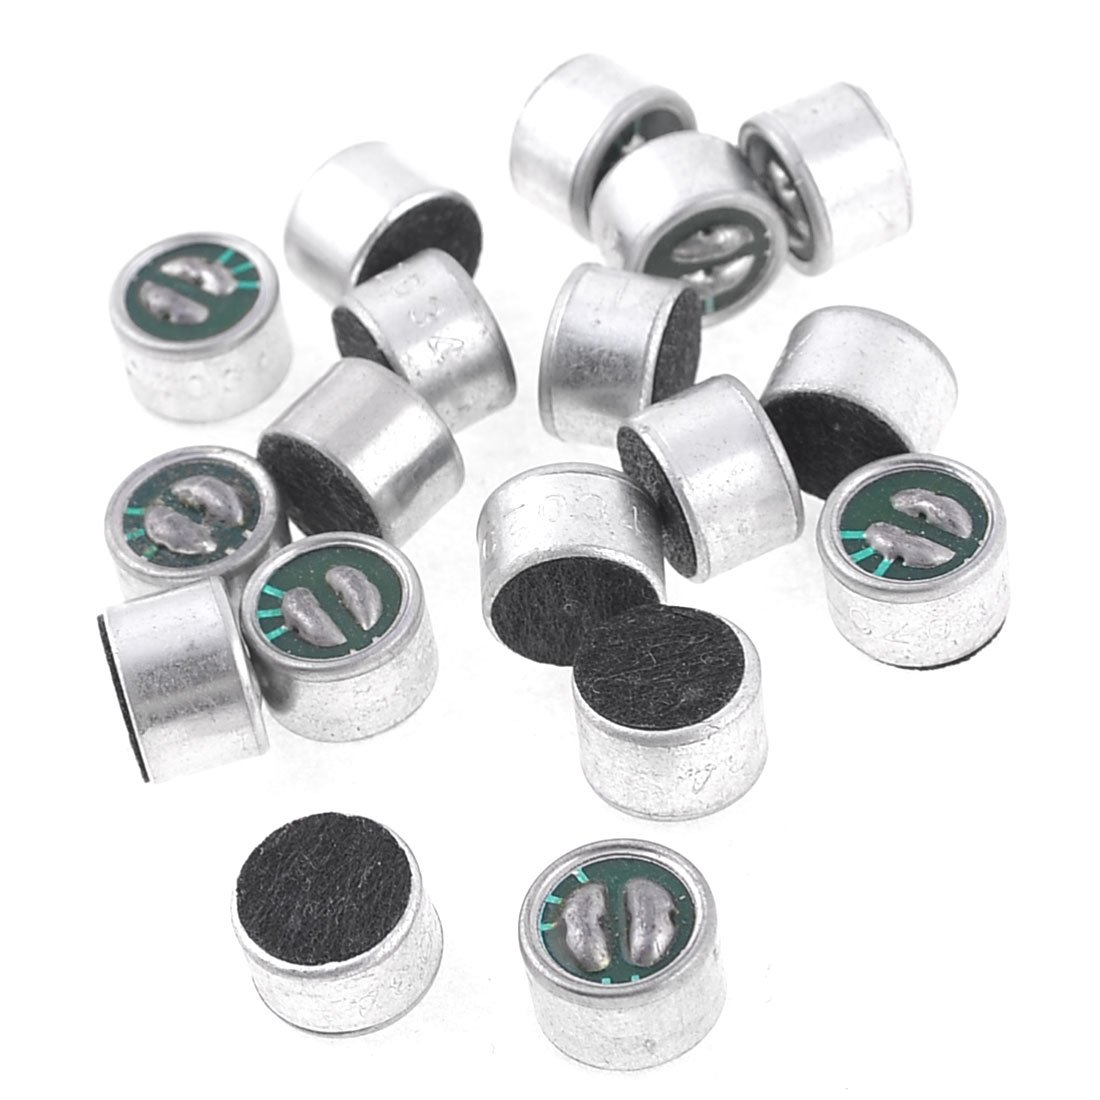 18 Pieces Mini MIC Capsule Electret Condenser Microphone